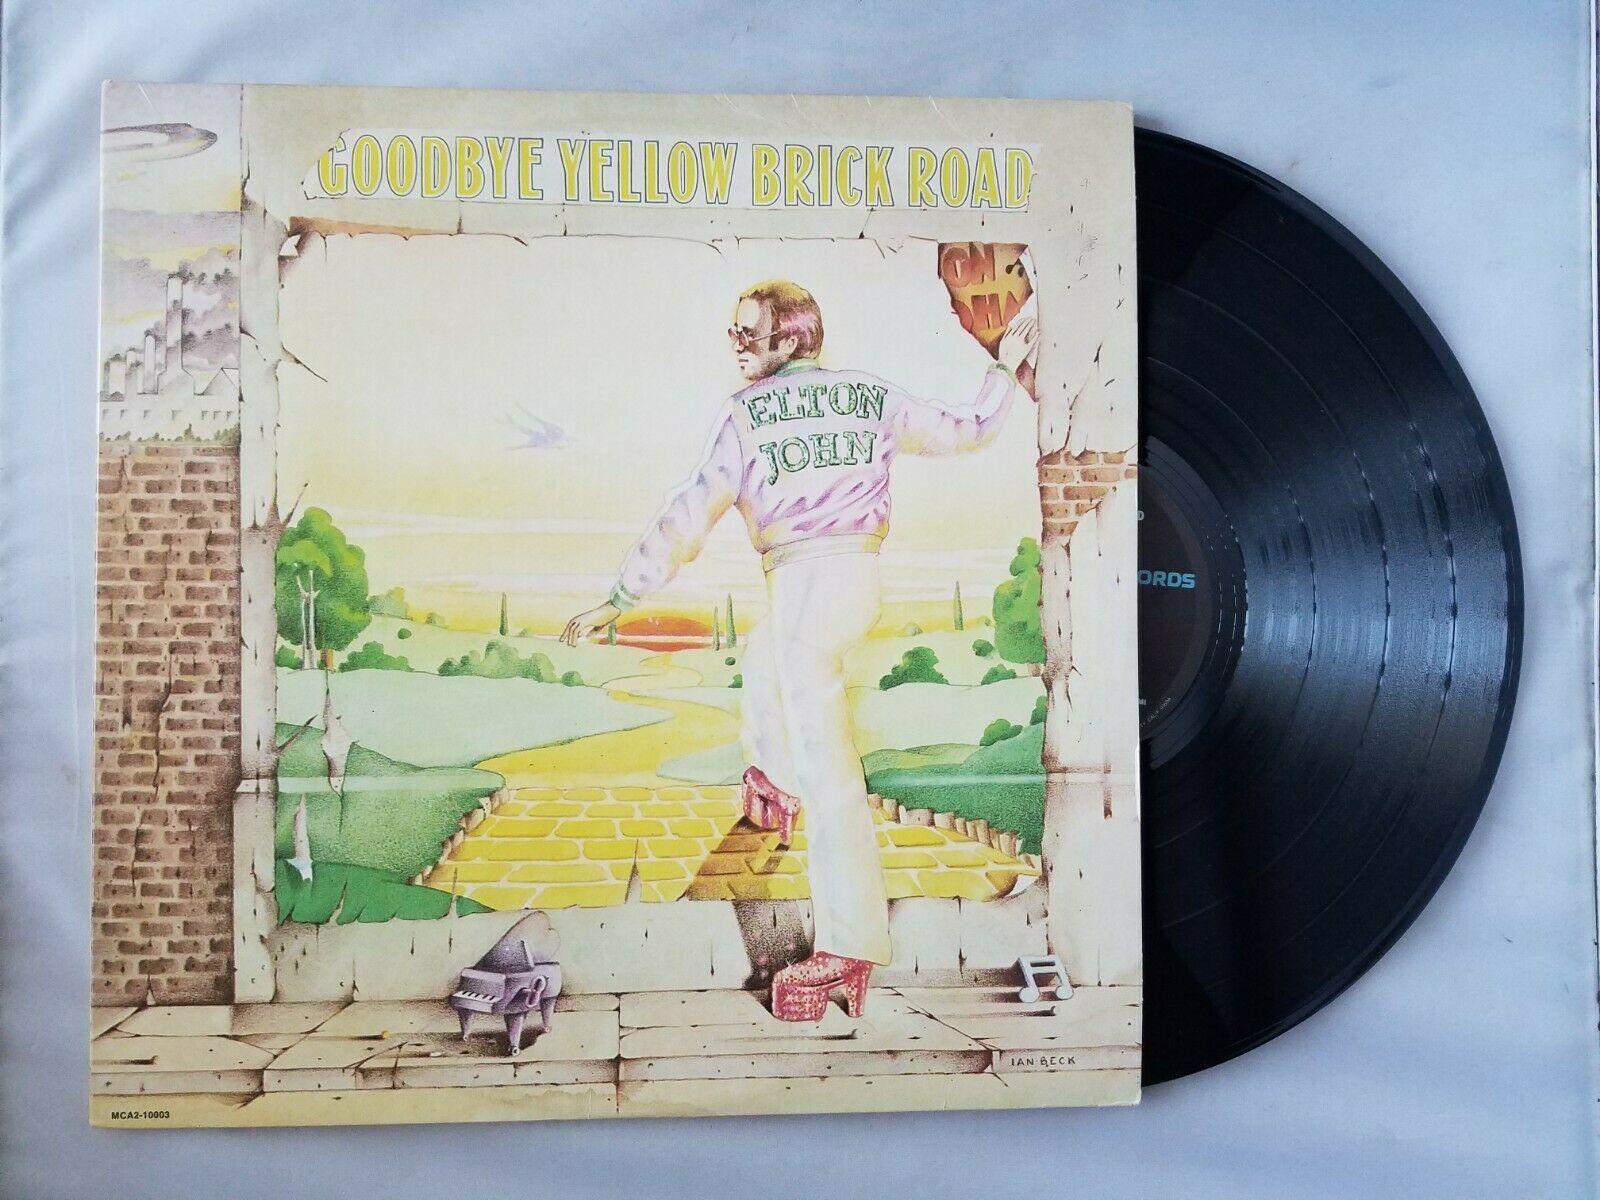 Elton John Yellow Brick Road Disco in Vinile Vintage 1973 MCA Records